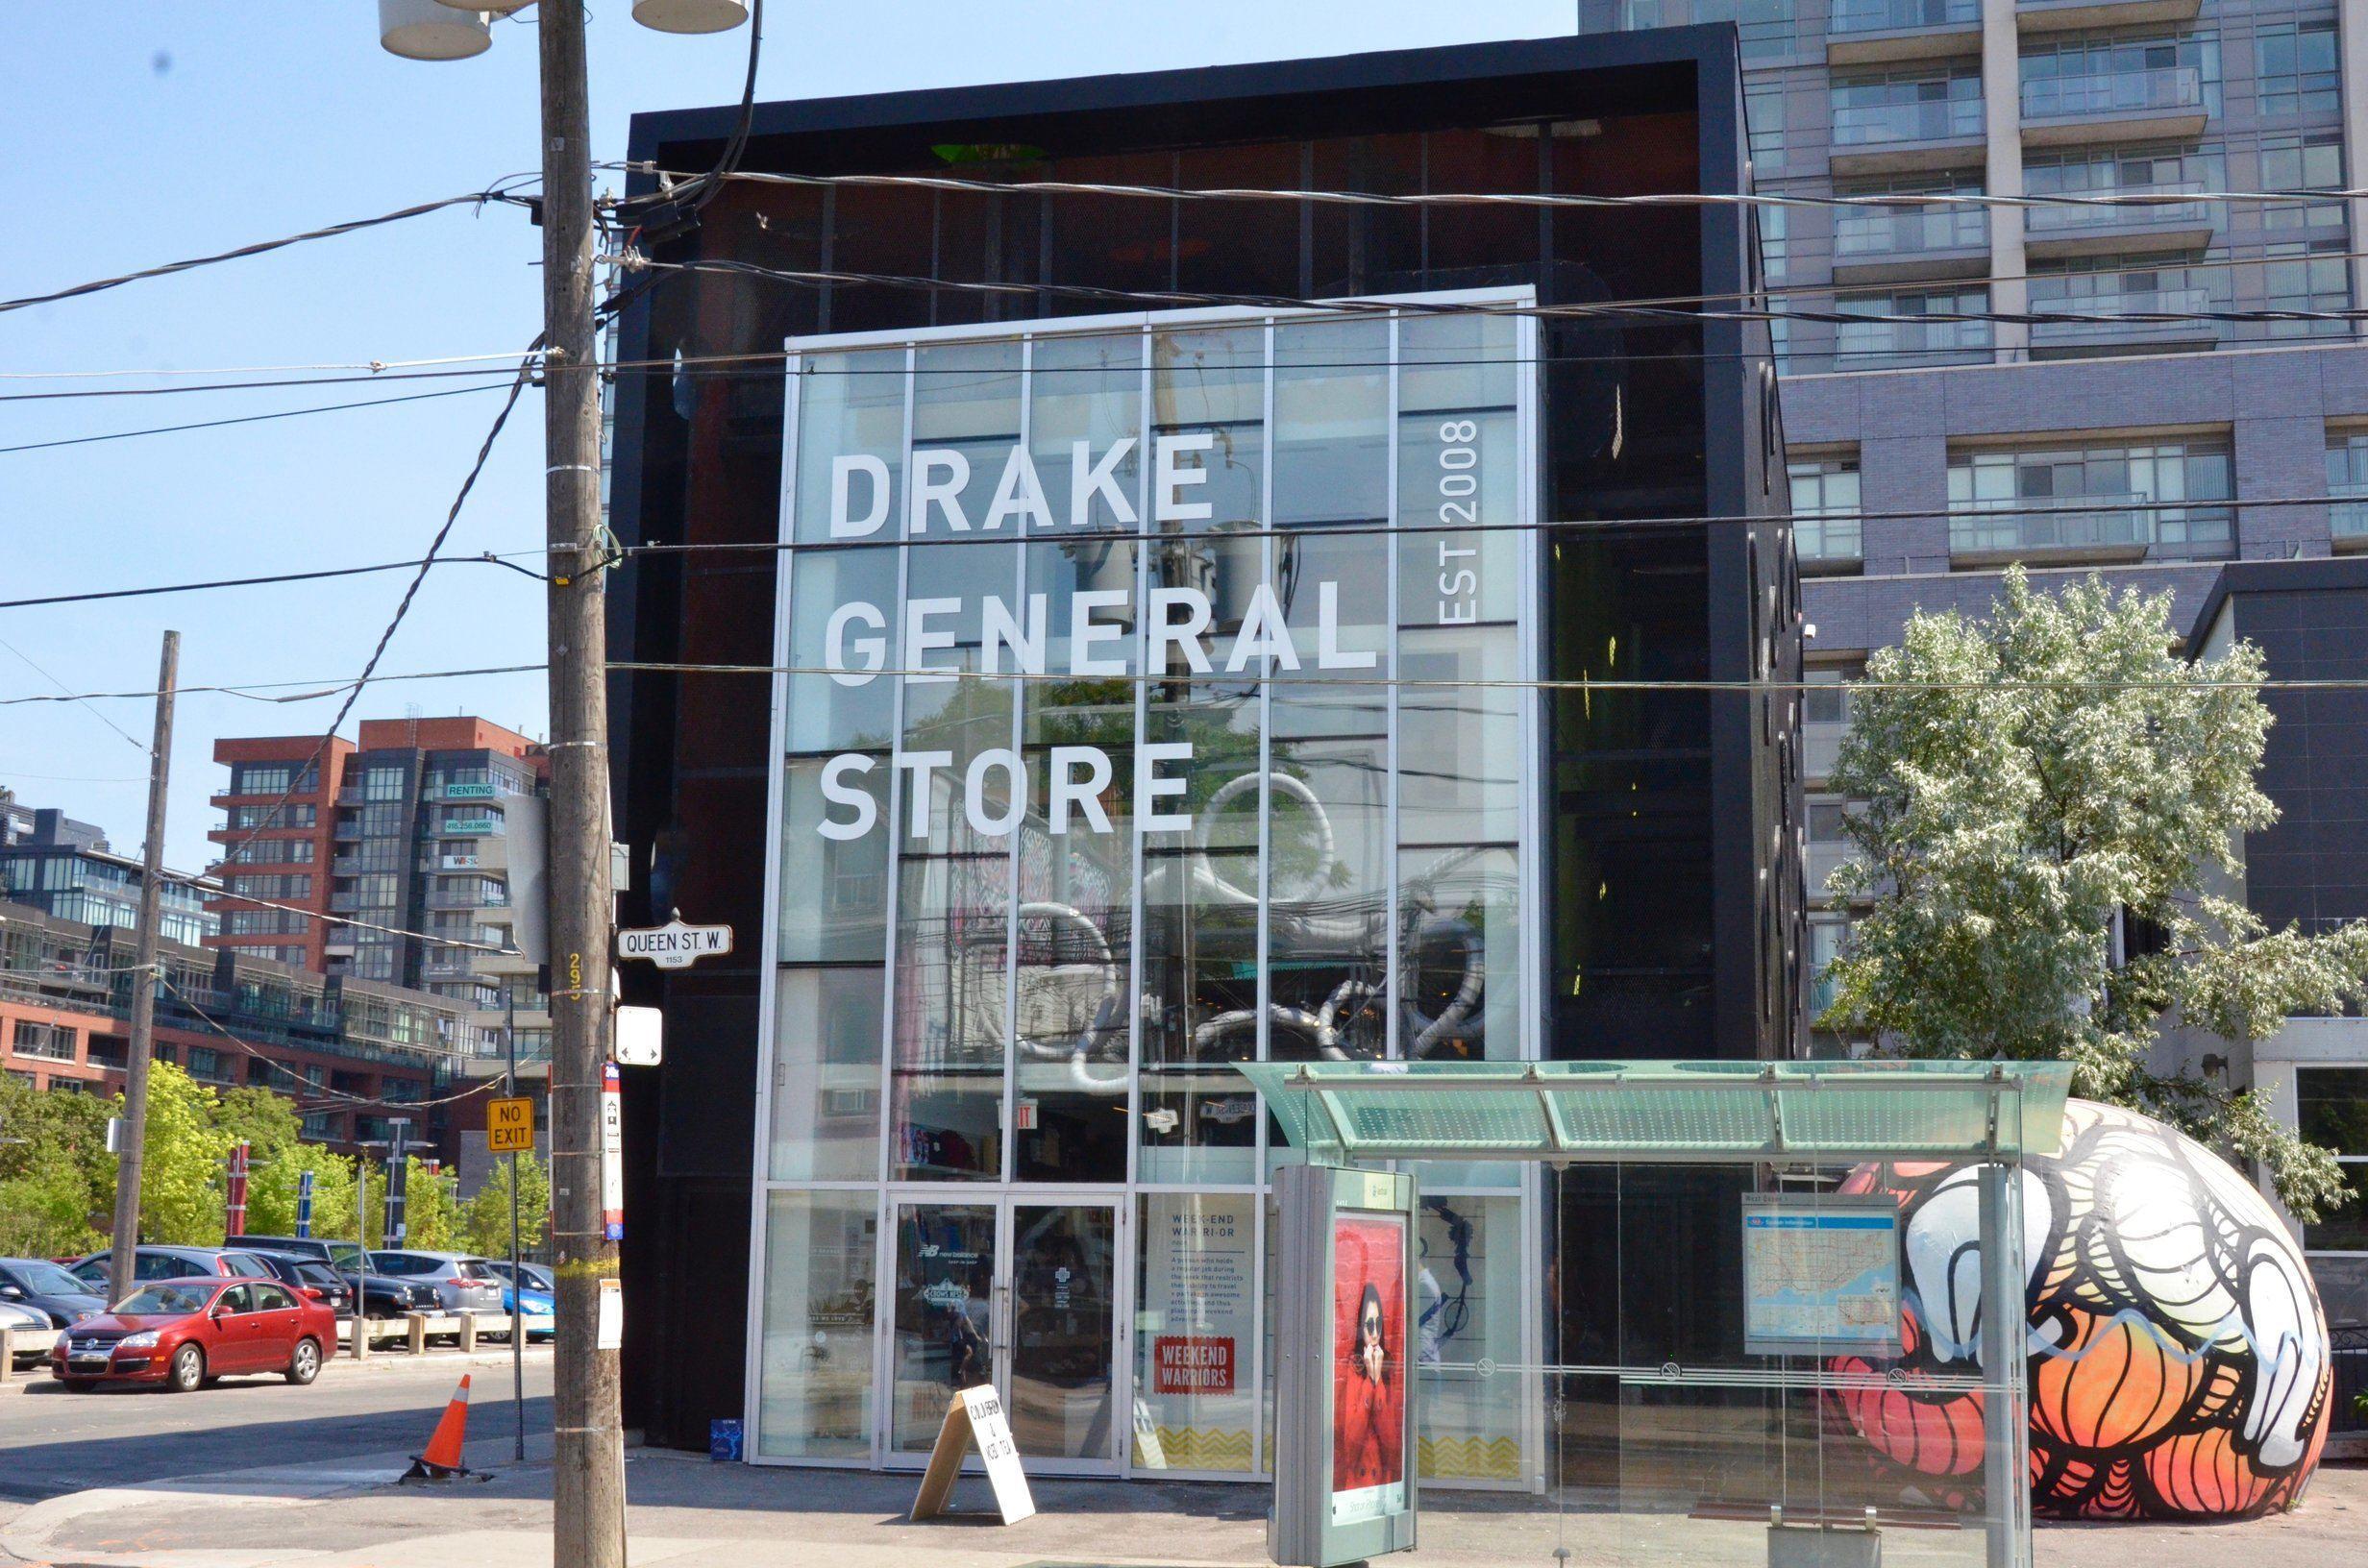 Drake general store cover